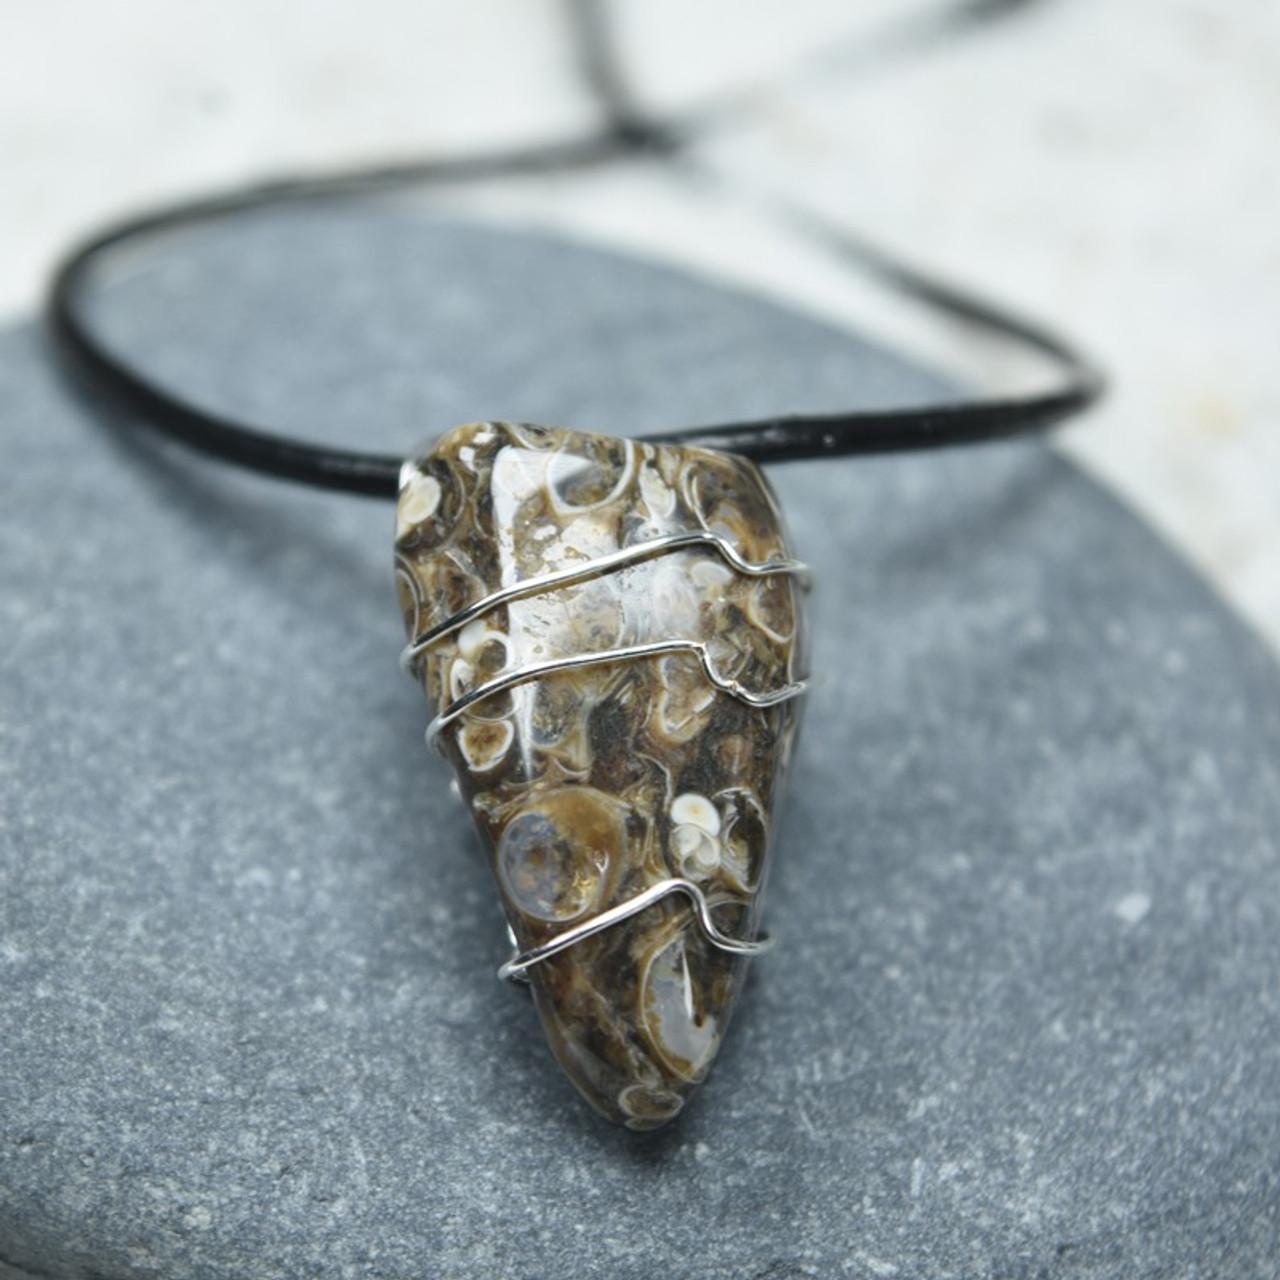 Tumbled Turritella Stone Wire Wrapped Necklace